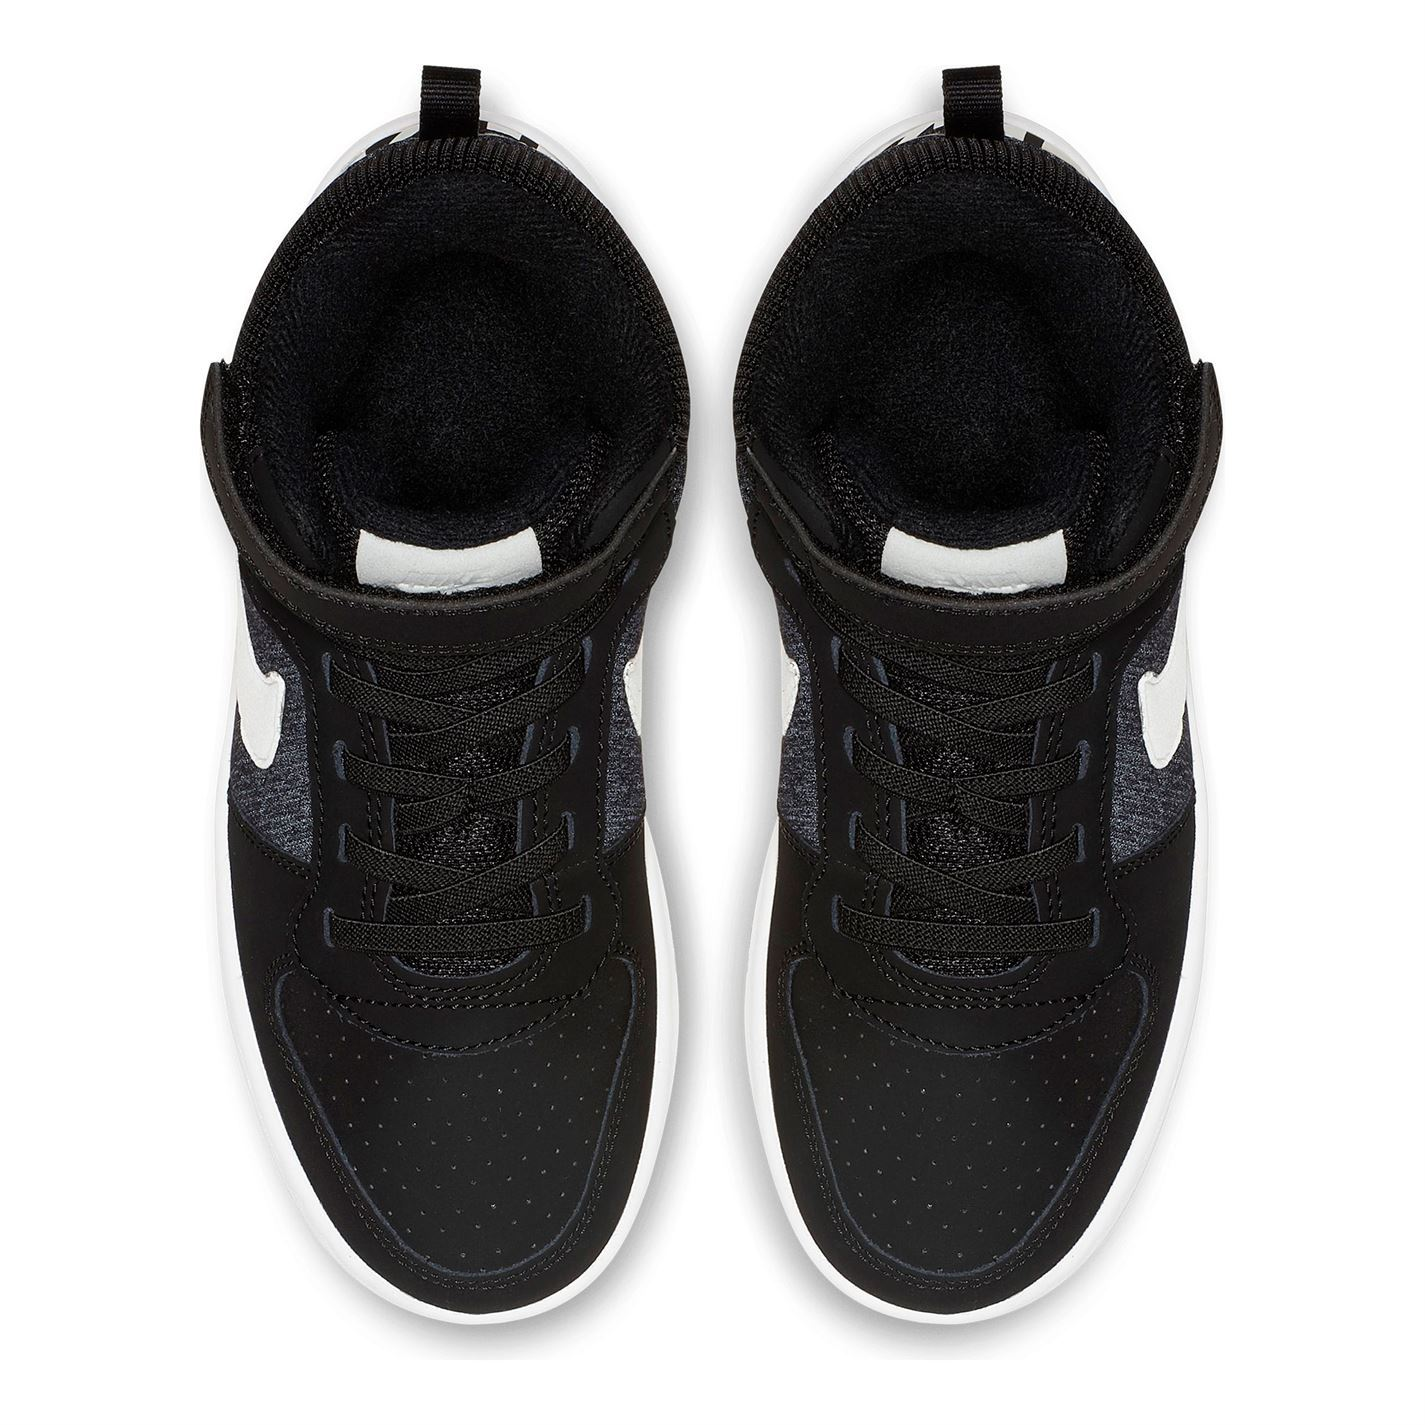 uk availability 30312 a28d0 ... Nike Court Borough Mid SE Child Boys Trainers Black Shoes Footwear